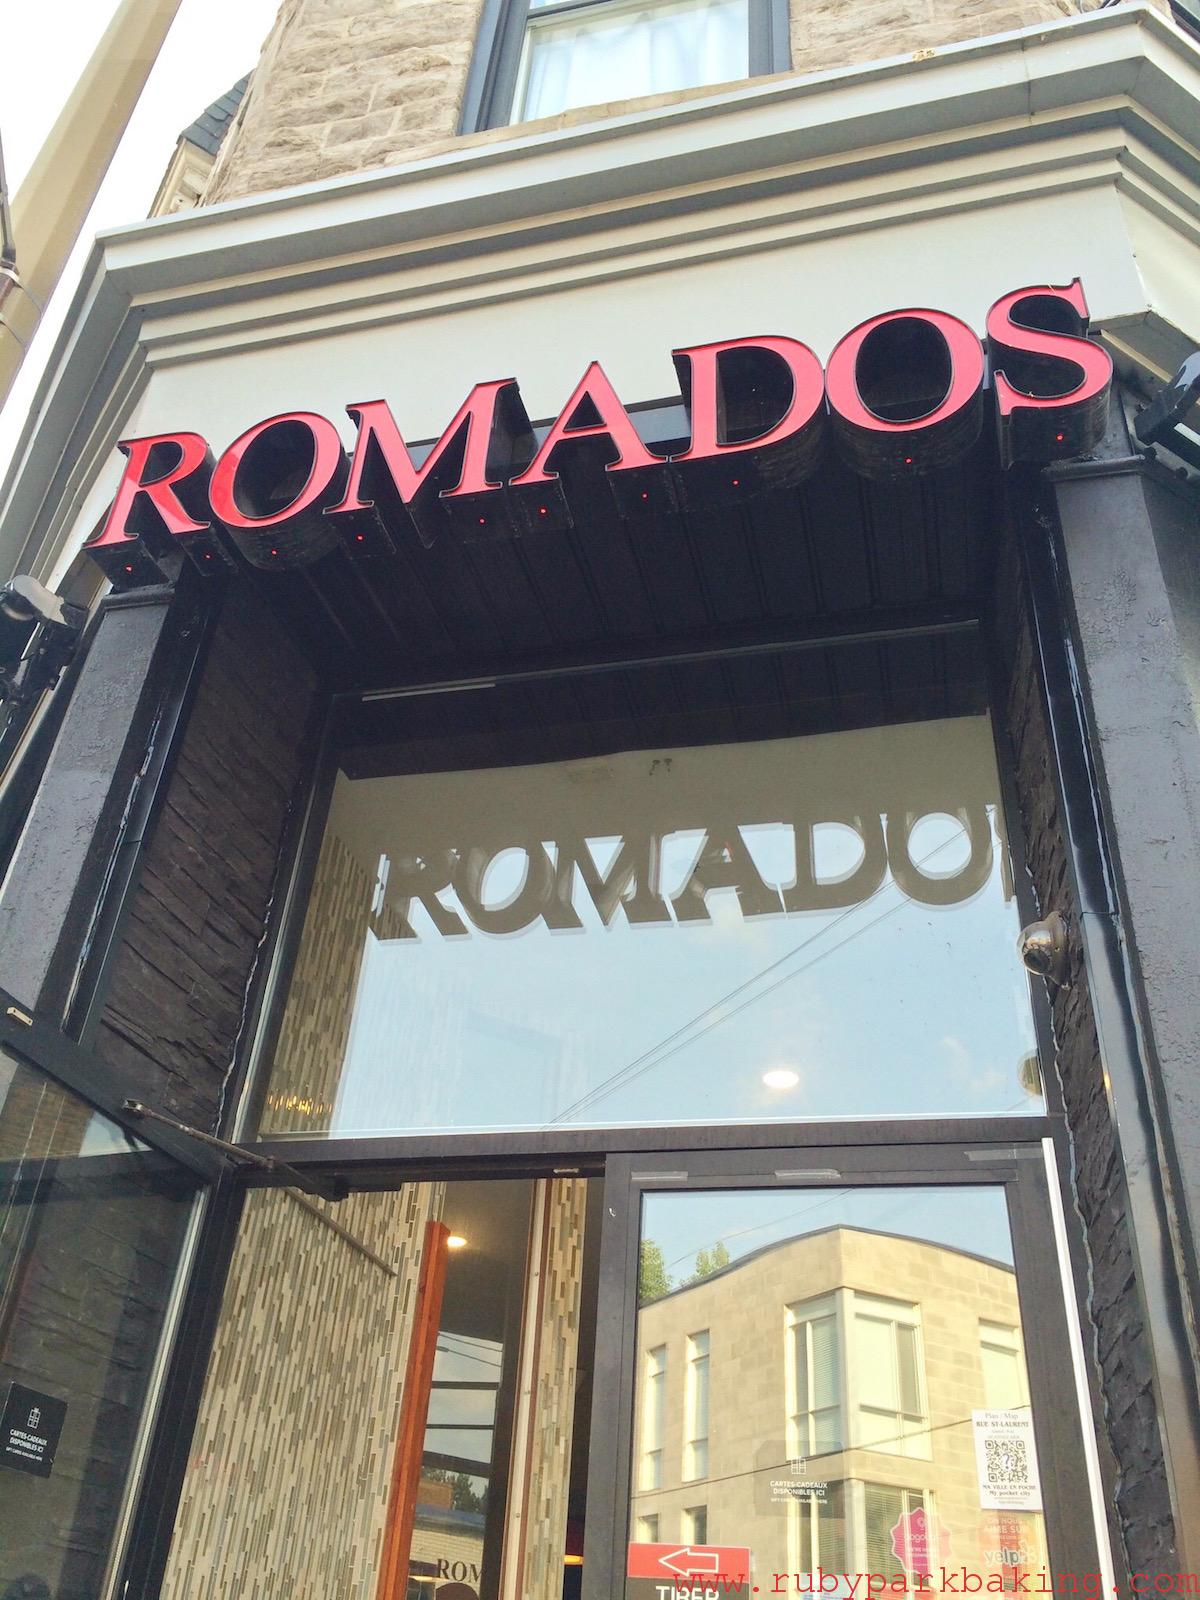 Rotisserie Romados, Montréal